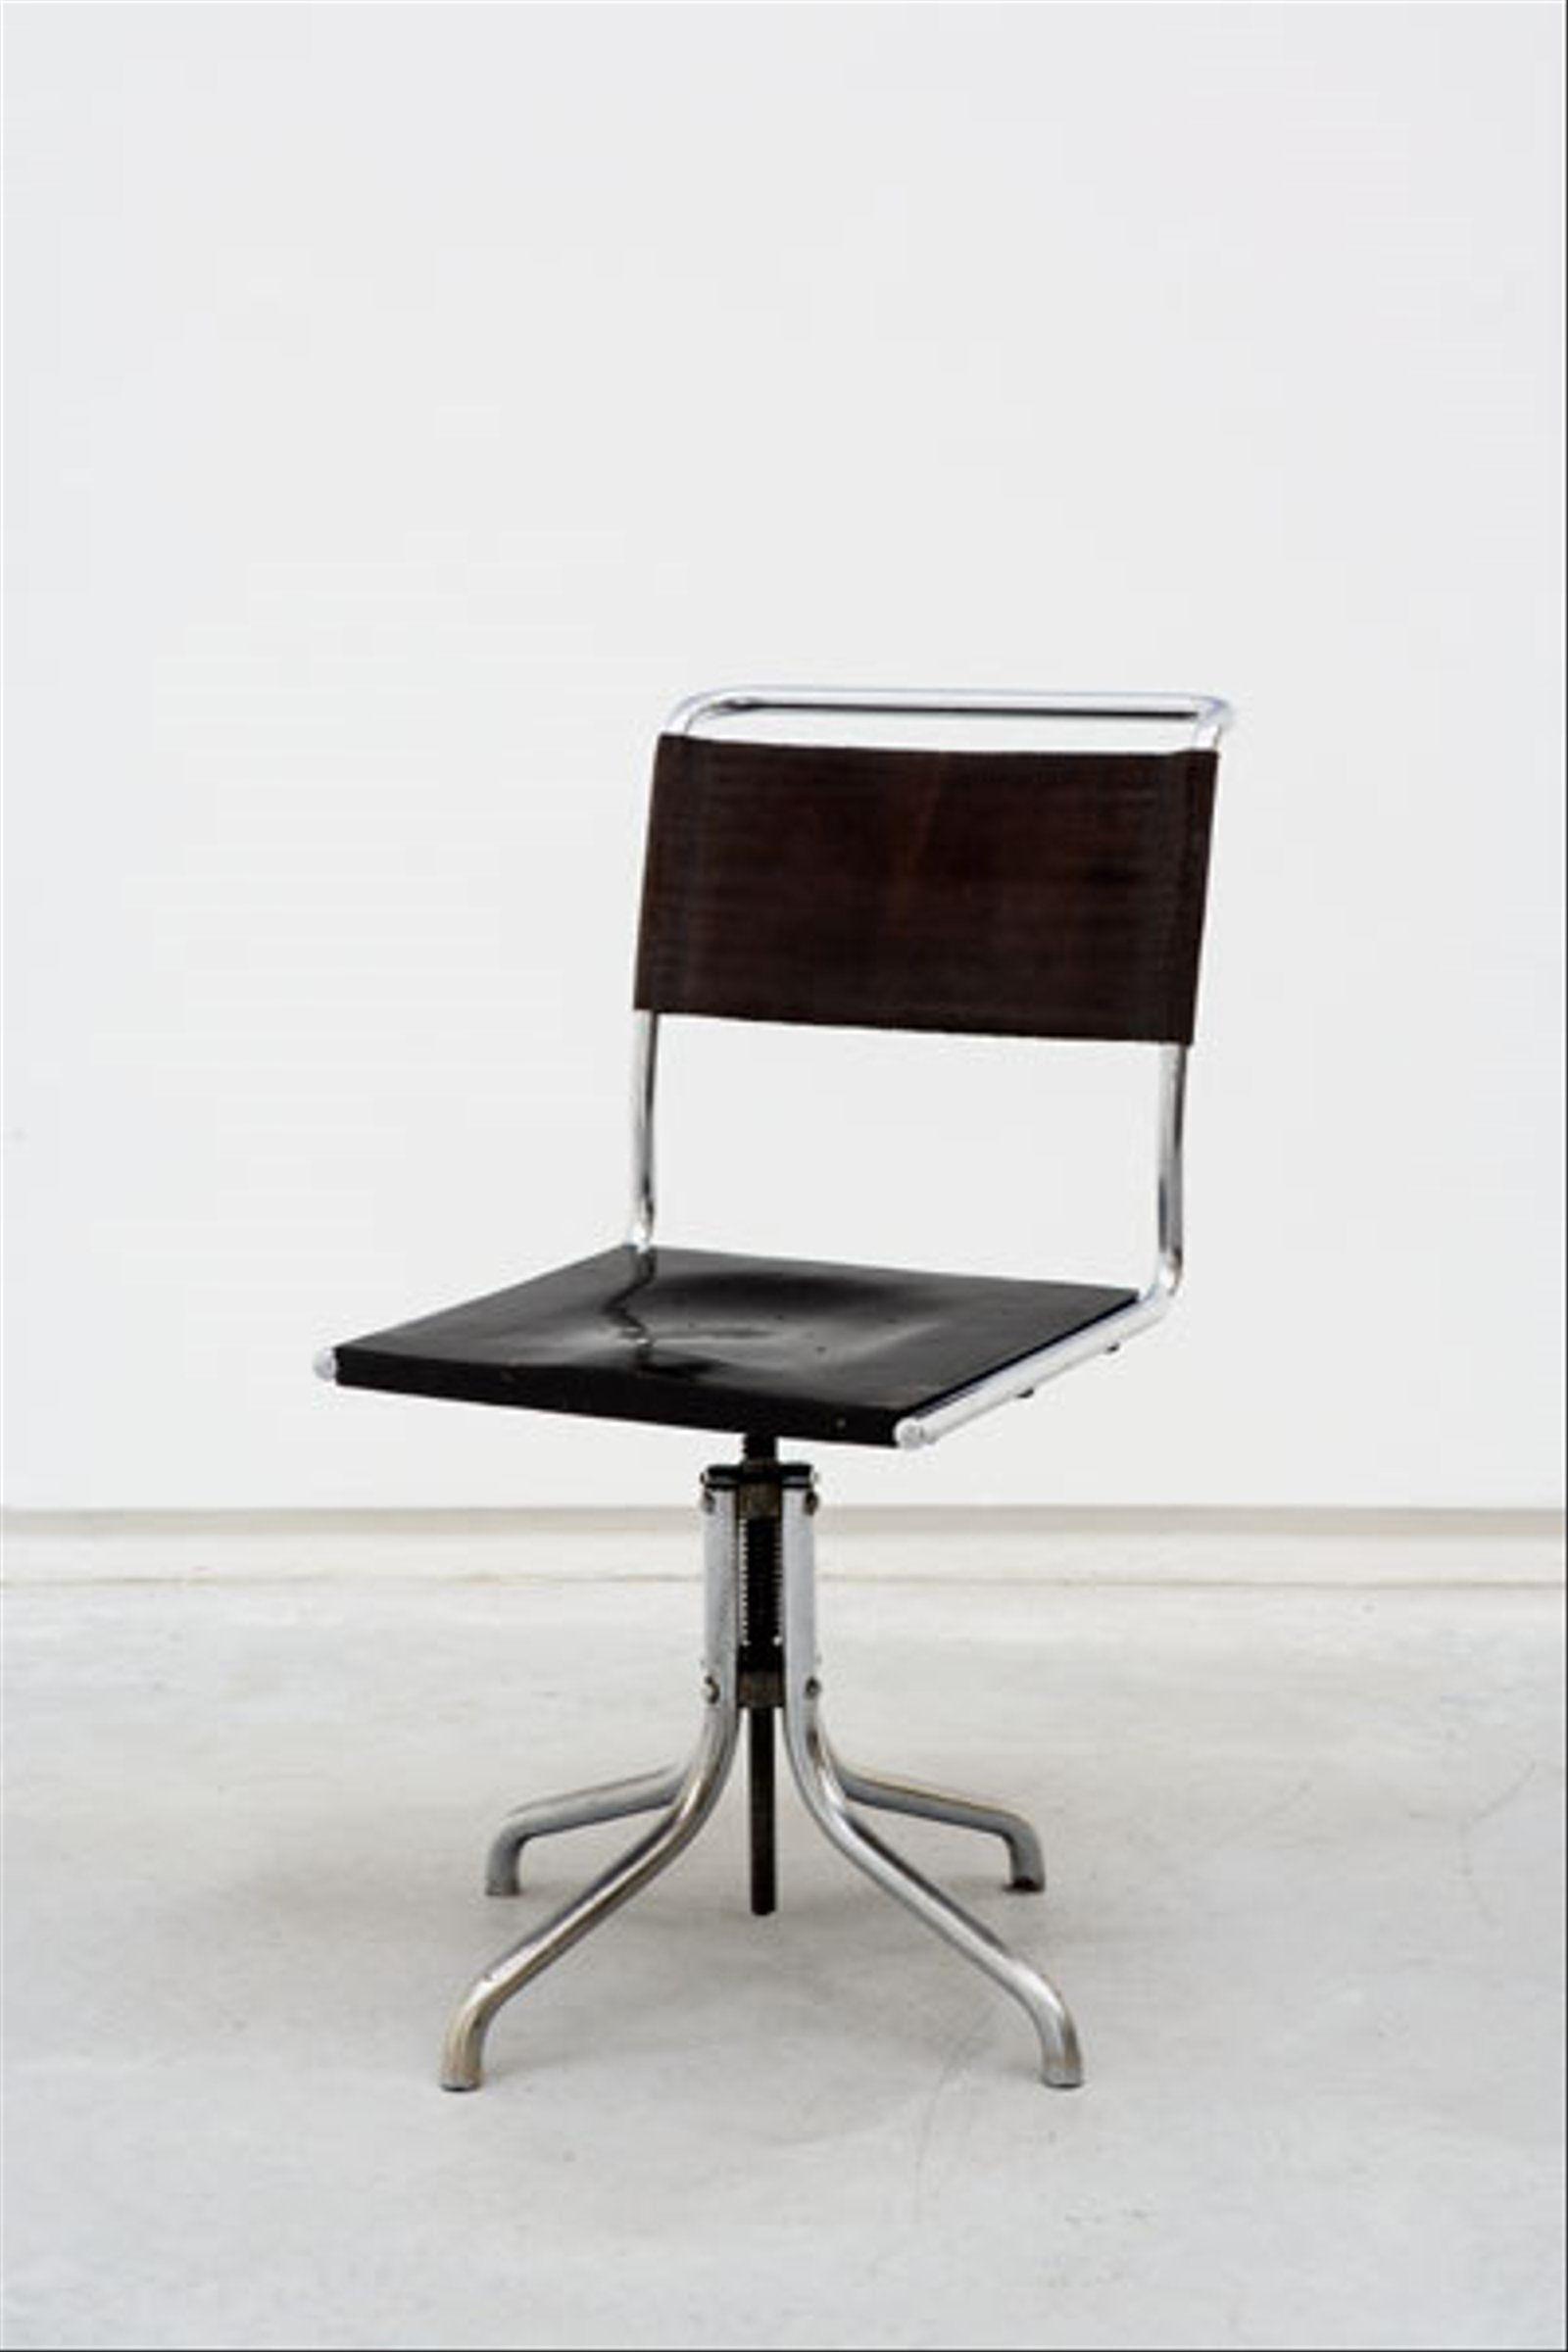 9 marcel breuer early swivel chair model no b7 c on design pinterest m bel bauhaus. Black Bedroom Furniture Sets. Home Design Ideas